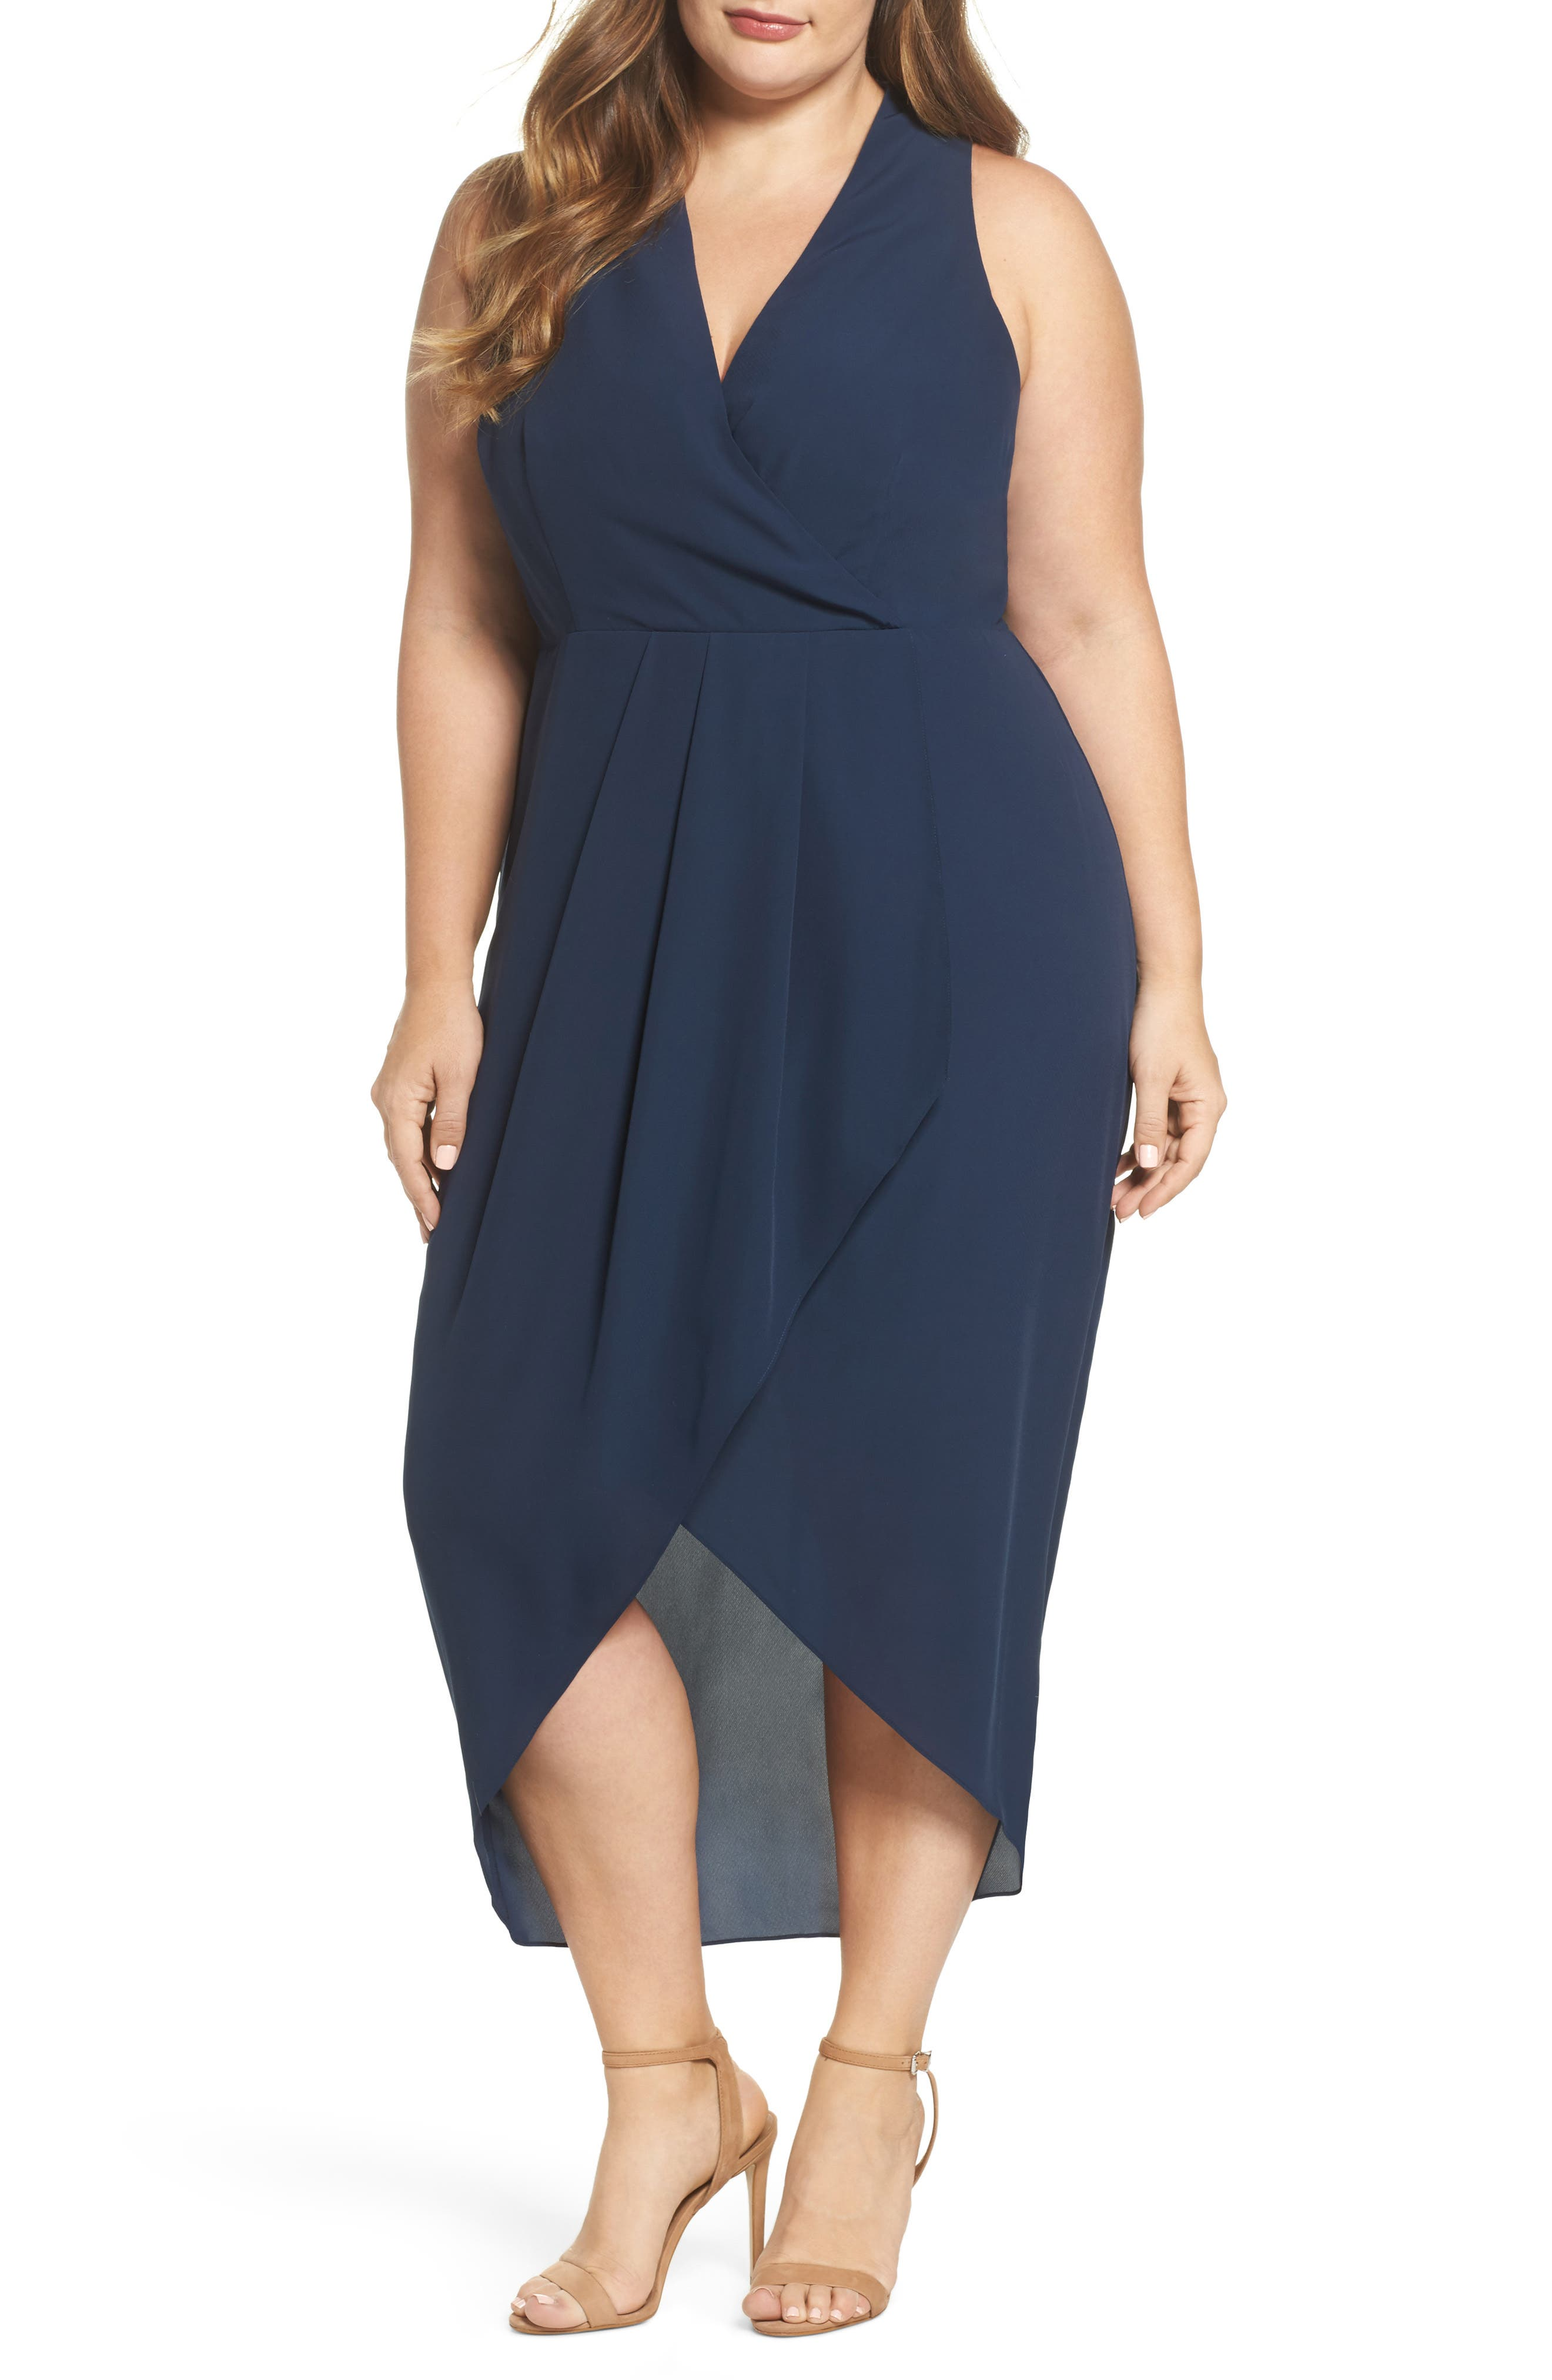 Main Image - Cooper St. Evening Light Drape Dress (Plus Size)